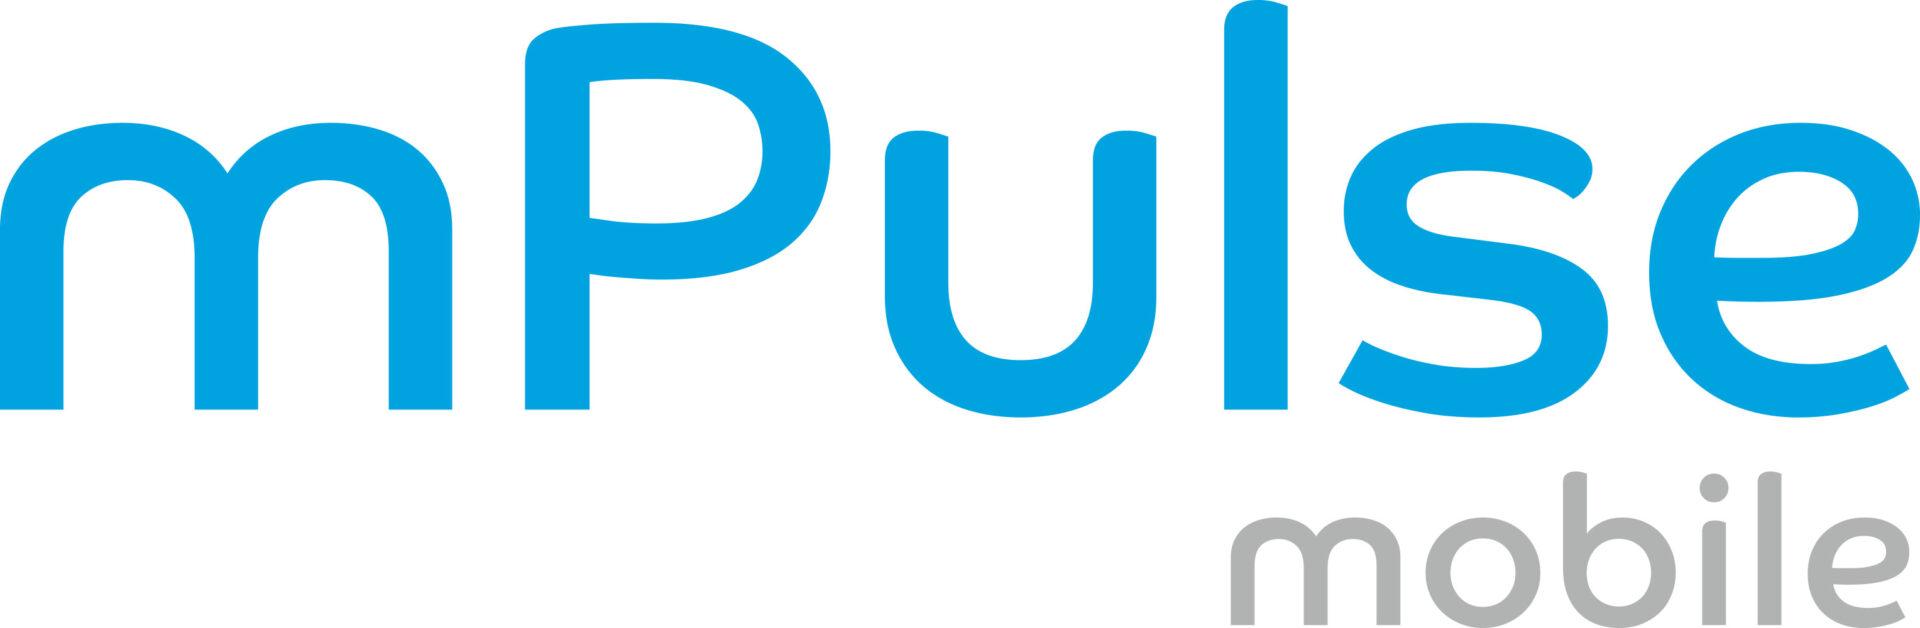 https://medicaidplans.org/wp-content/uploads/2021/01/mPulseMobileLogotype3055x1000-1-scaled.jpg